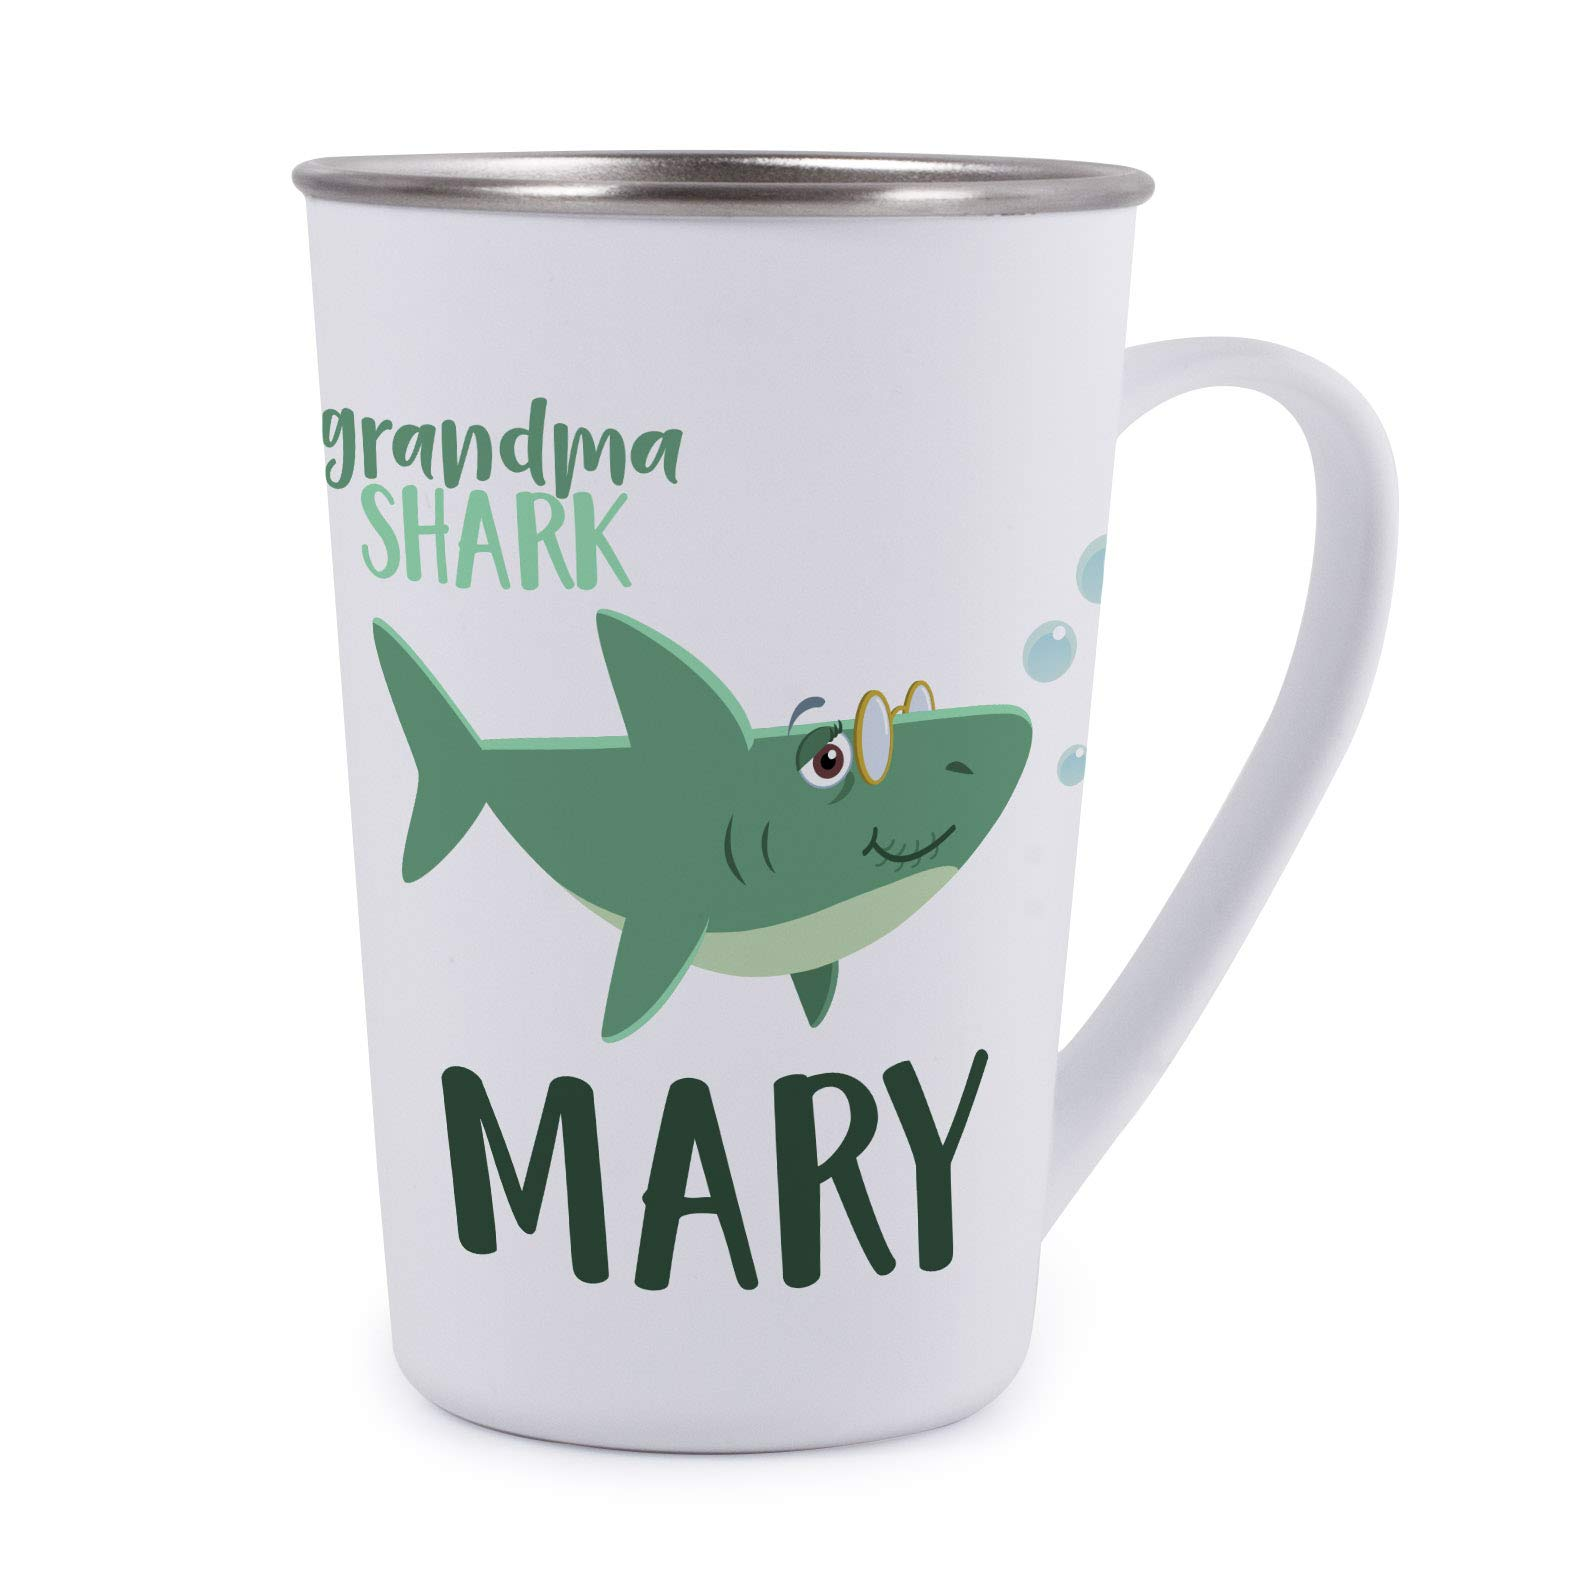 Personalized Gifts Shark Family Coffee Mug - 17oz Stainless Steel Tumbler Coffee Mug -Birthday Gifts, Christmas Gifts, Mother's Day - Baby, Boy, Girl, Mommy, Daddy, Grandma, Grandpa Sharks